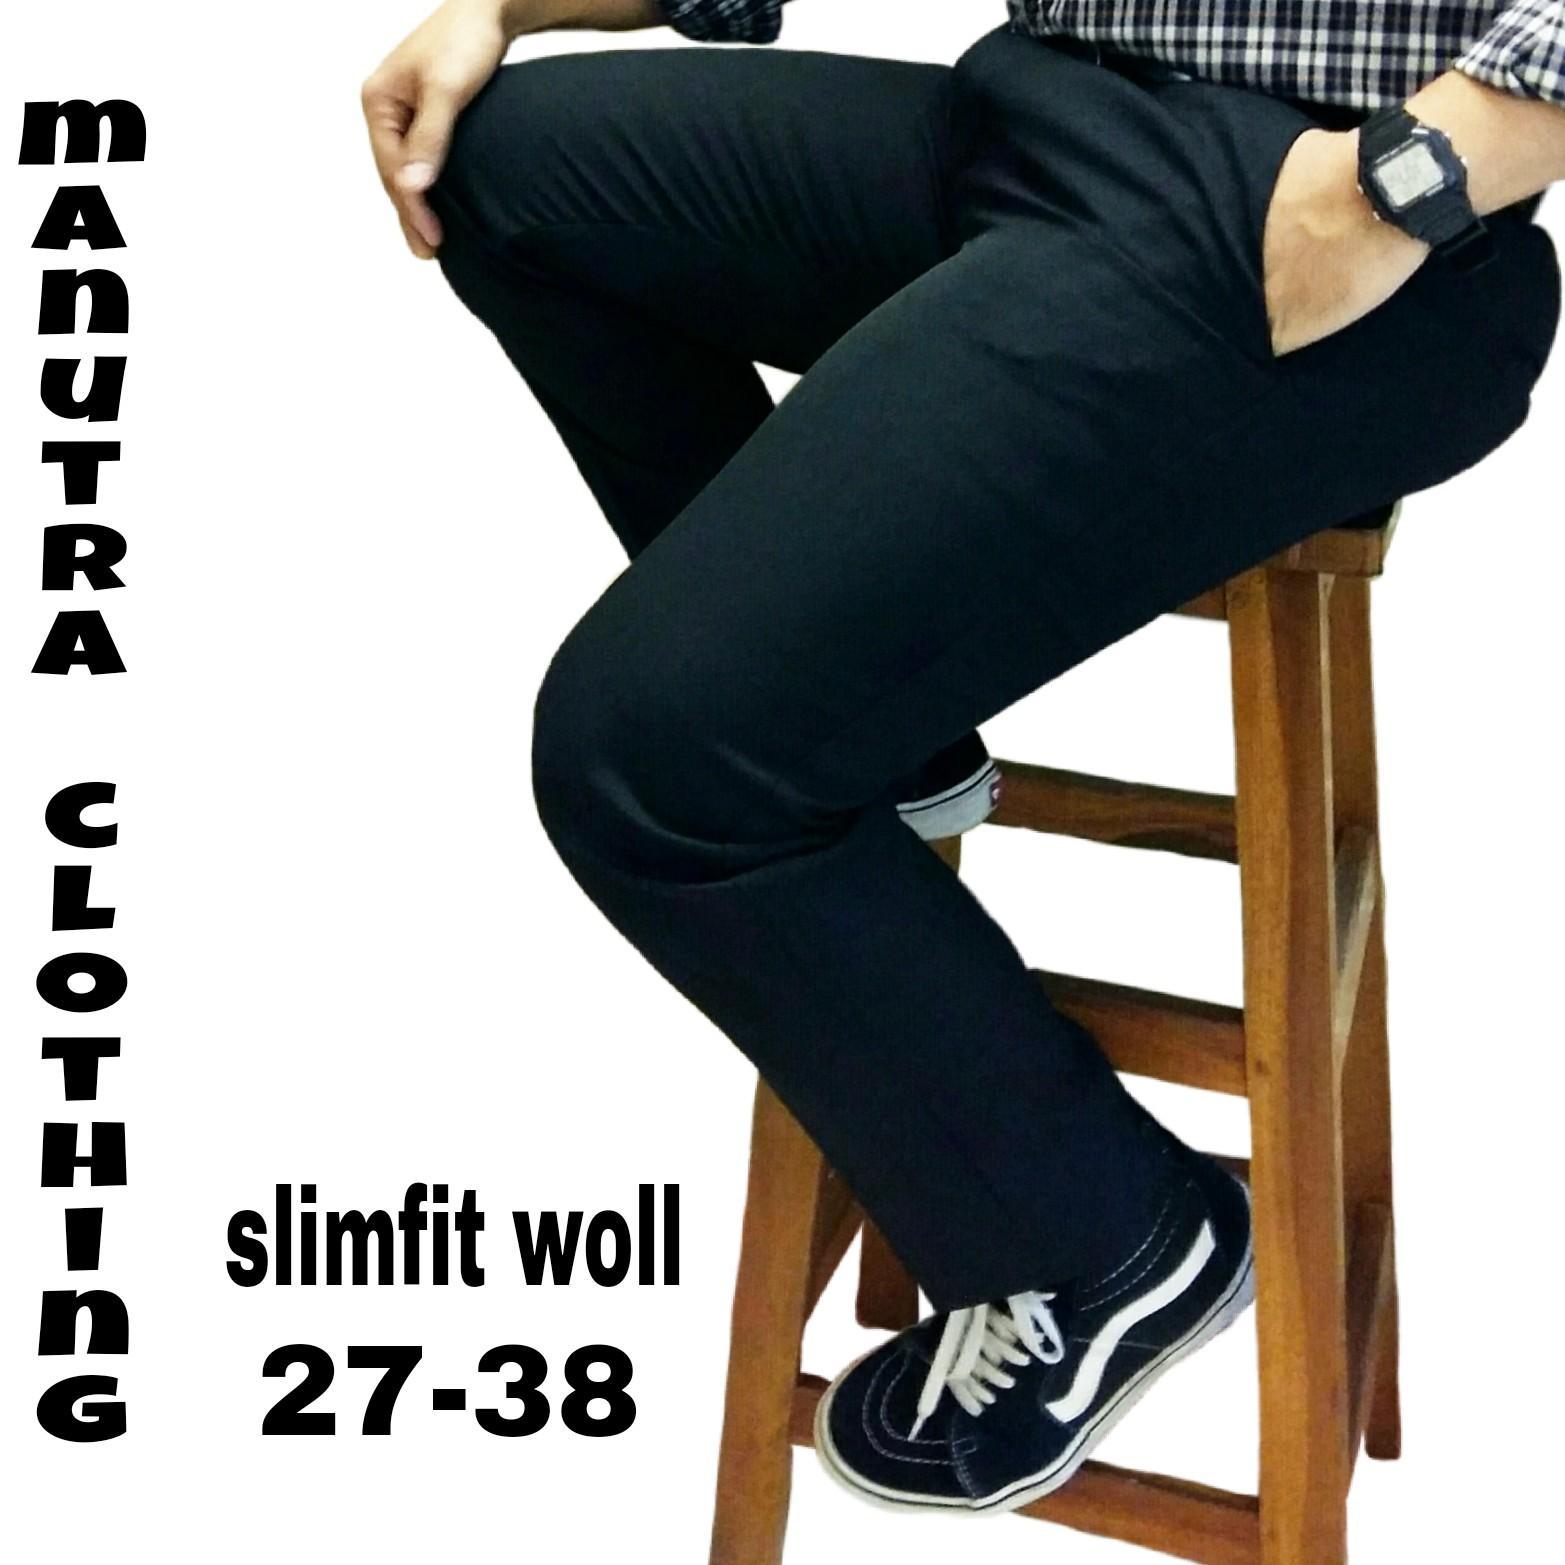 Celana bahan slimfit celana kerja kantor slimfit slimfitwol hitam 27 38